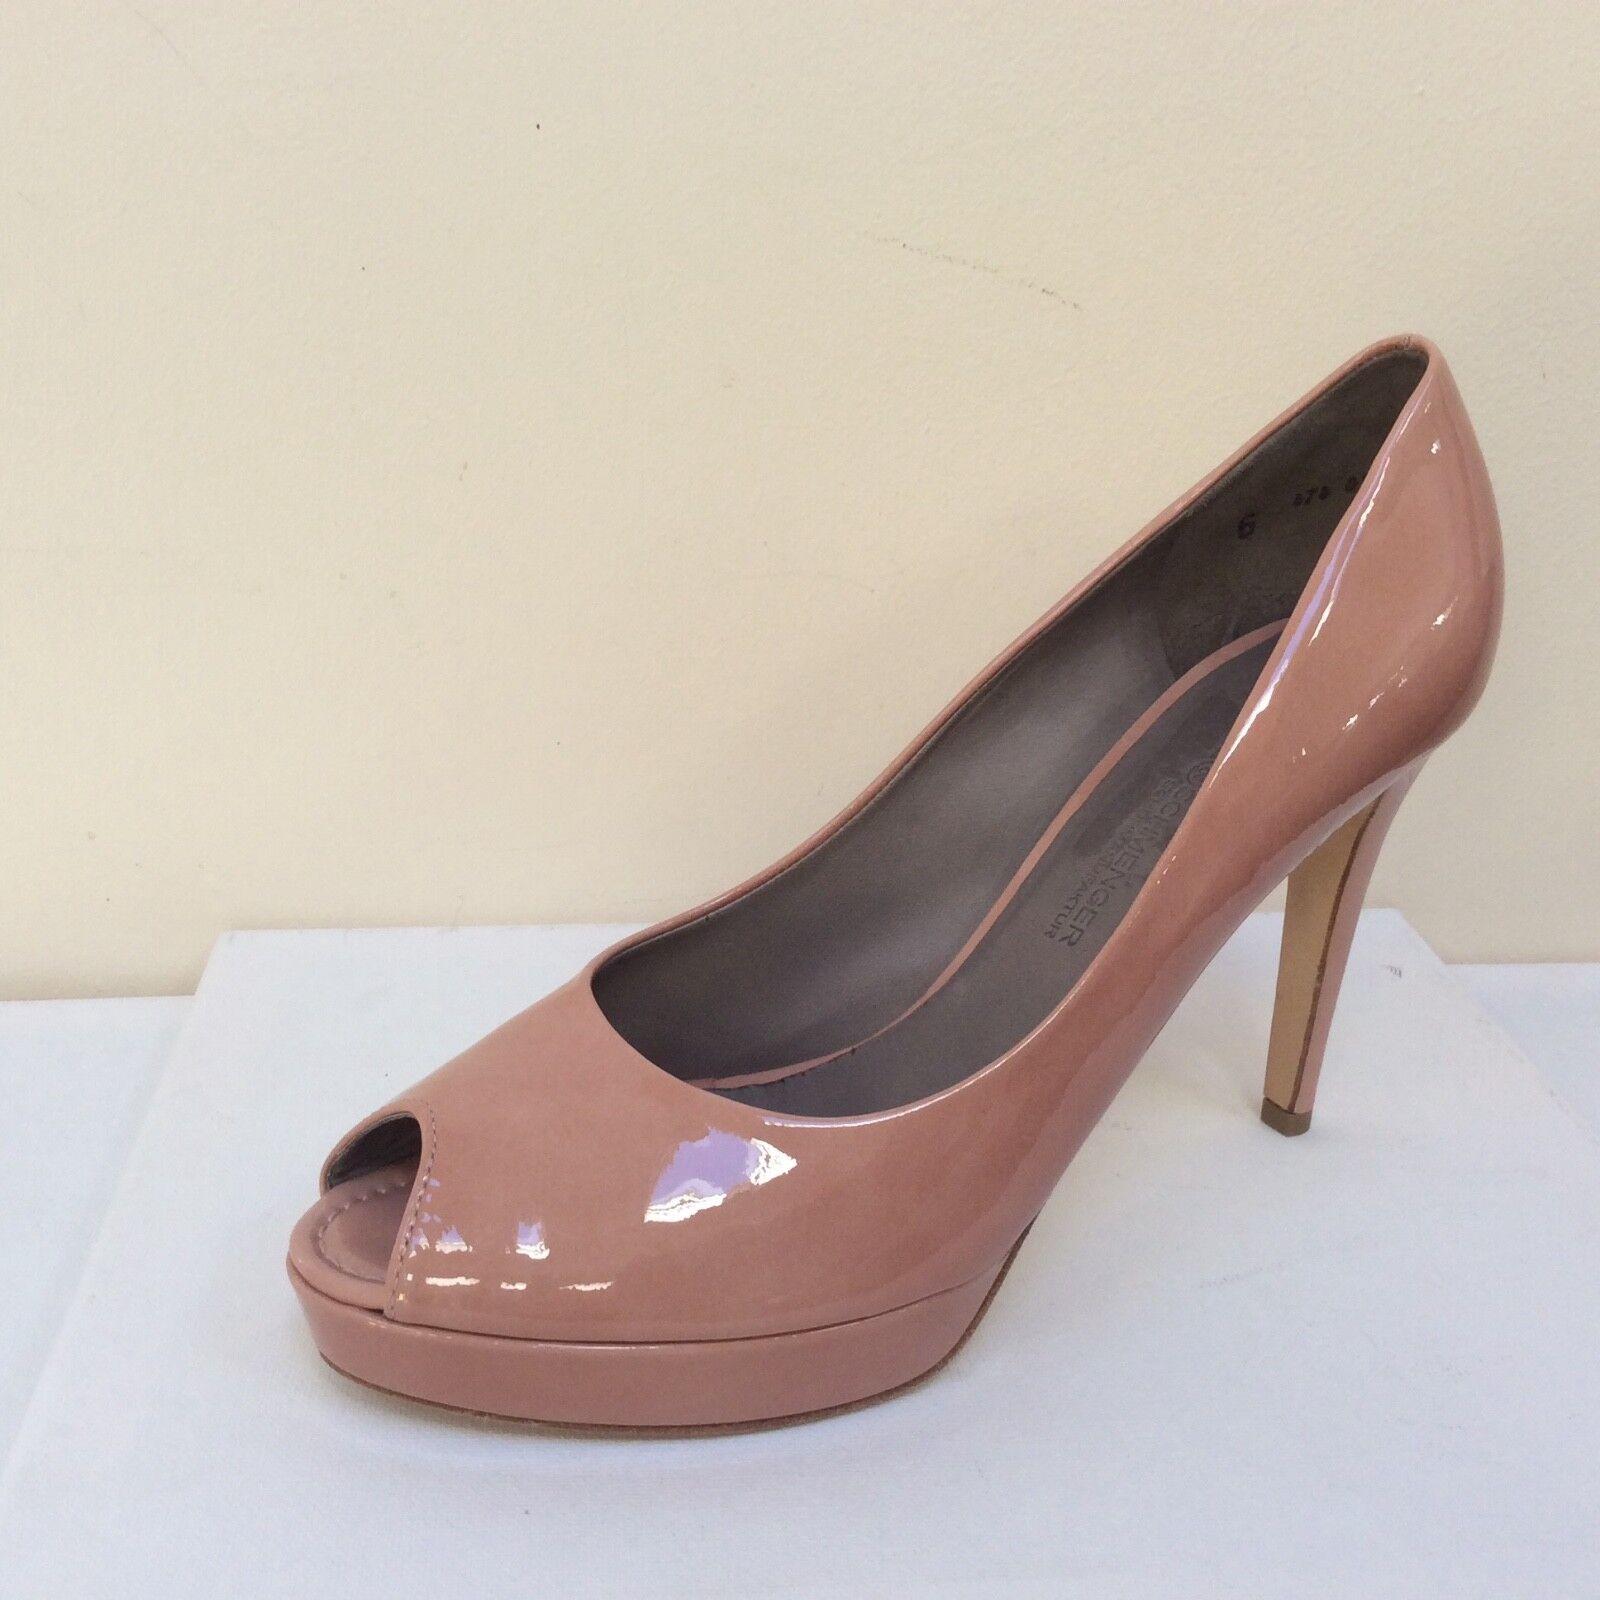 K&S Gia pink patent peep toe platform courts, UK 8 EU 41,   BNWB